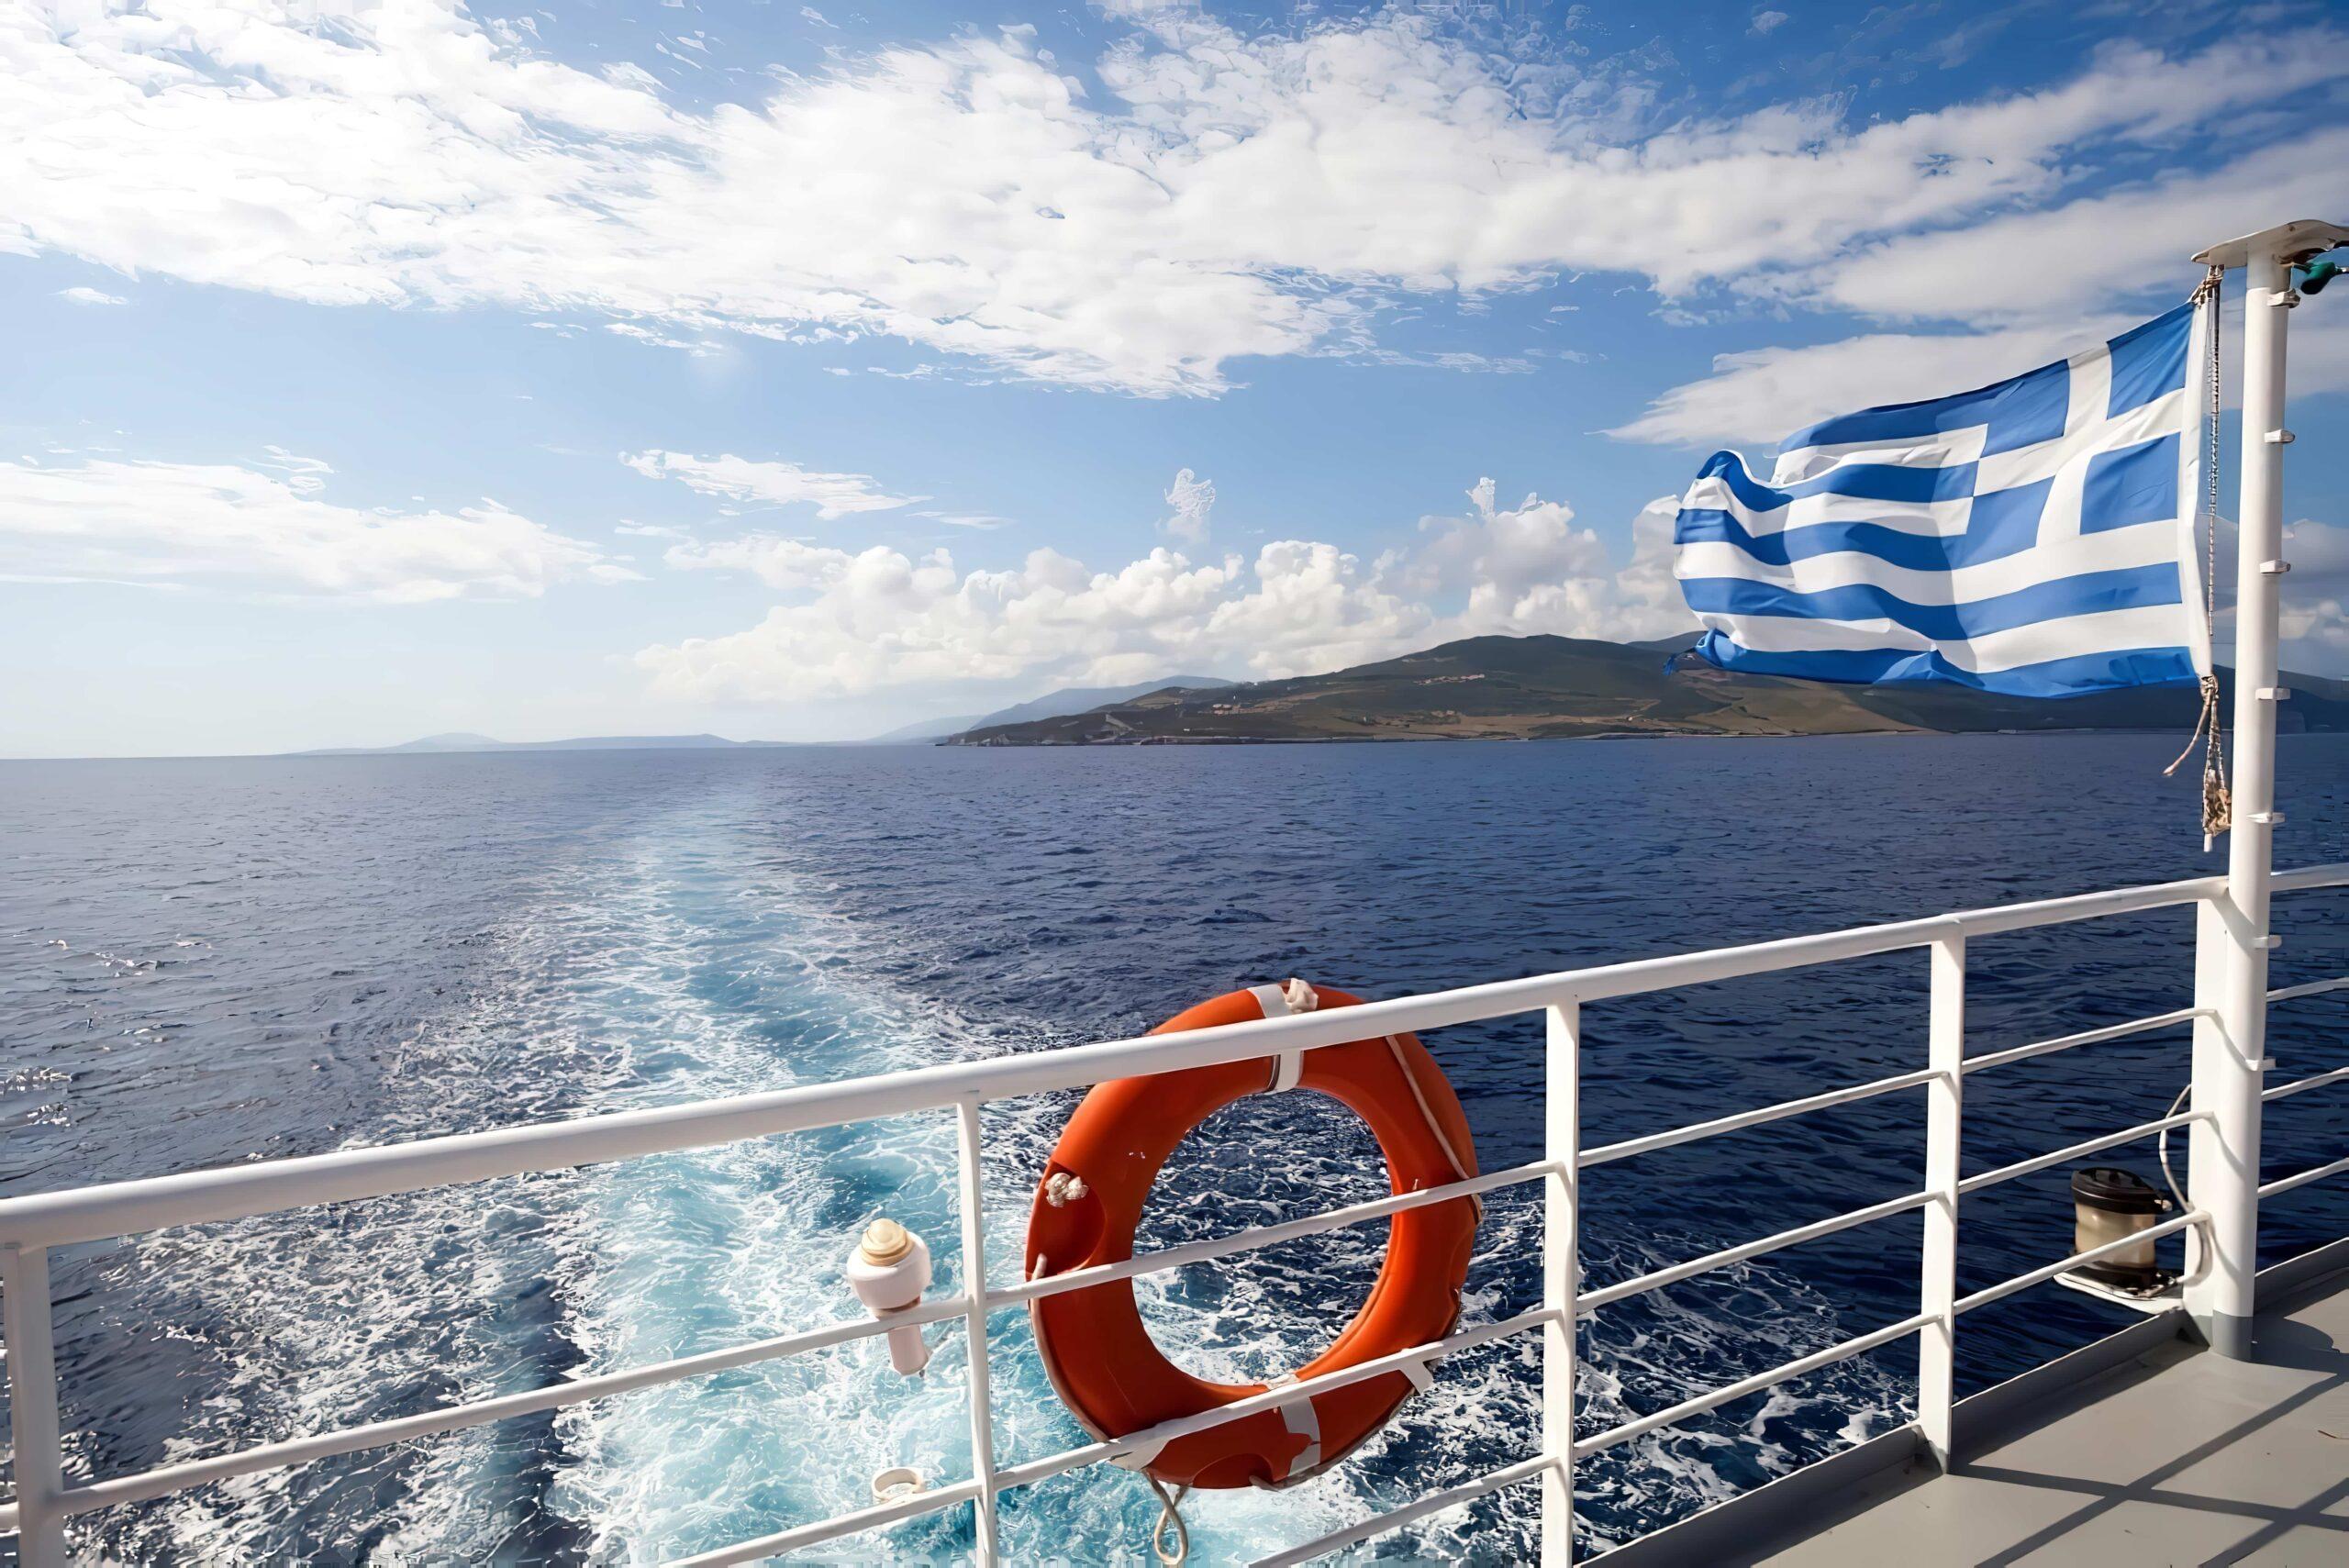 ferry grece Ikaria depuis Athènes en ferry